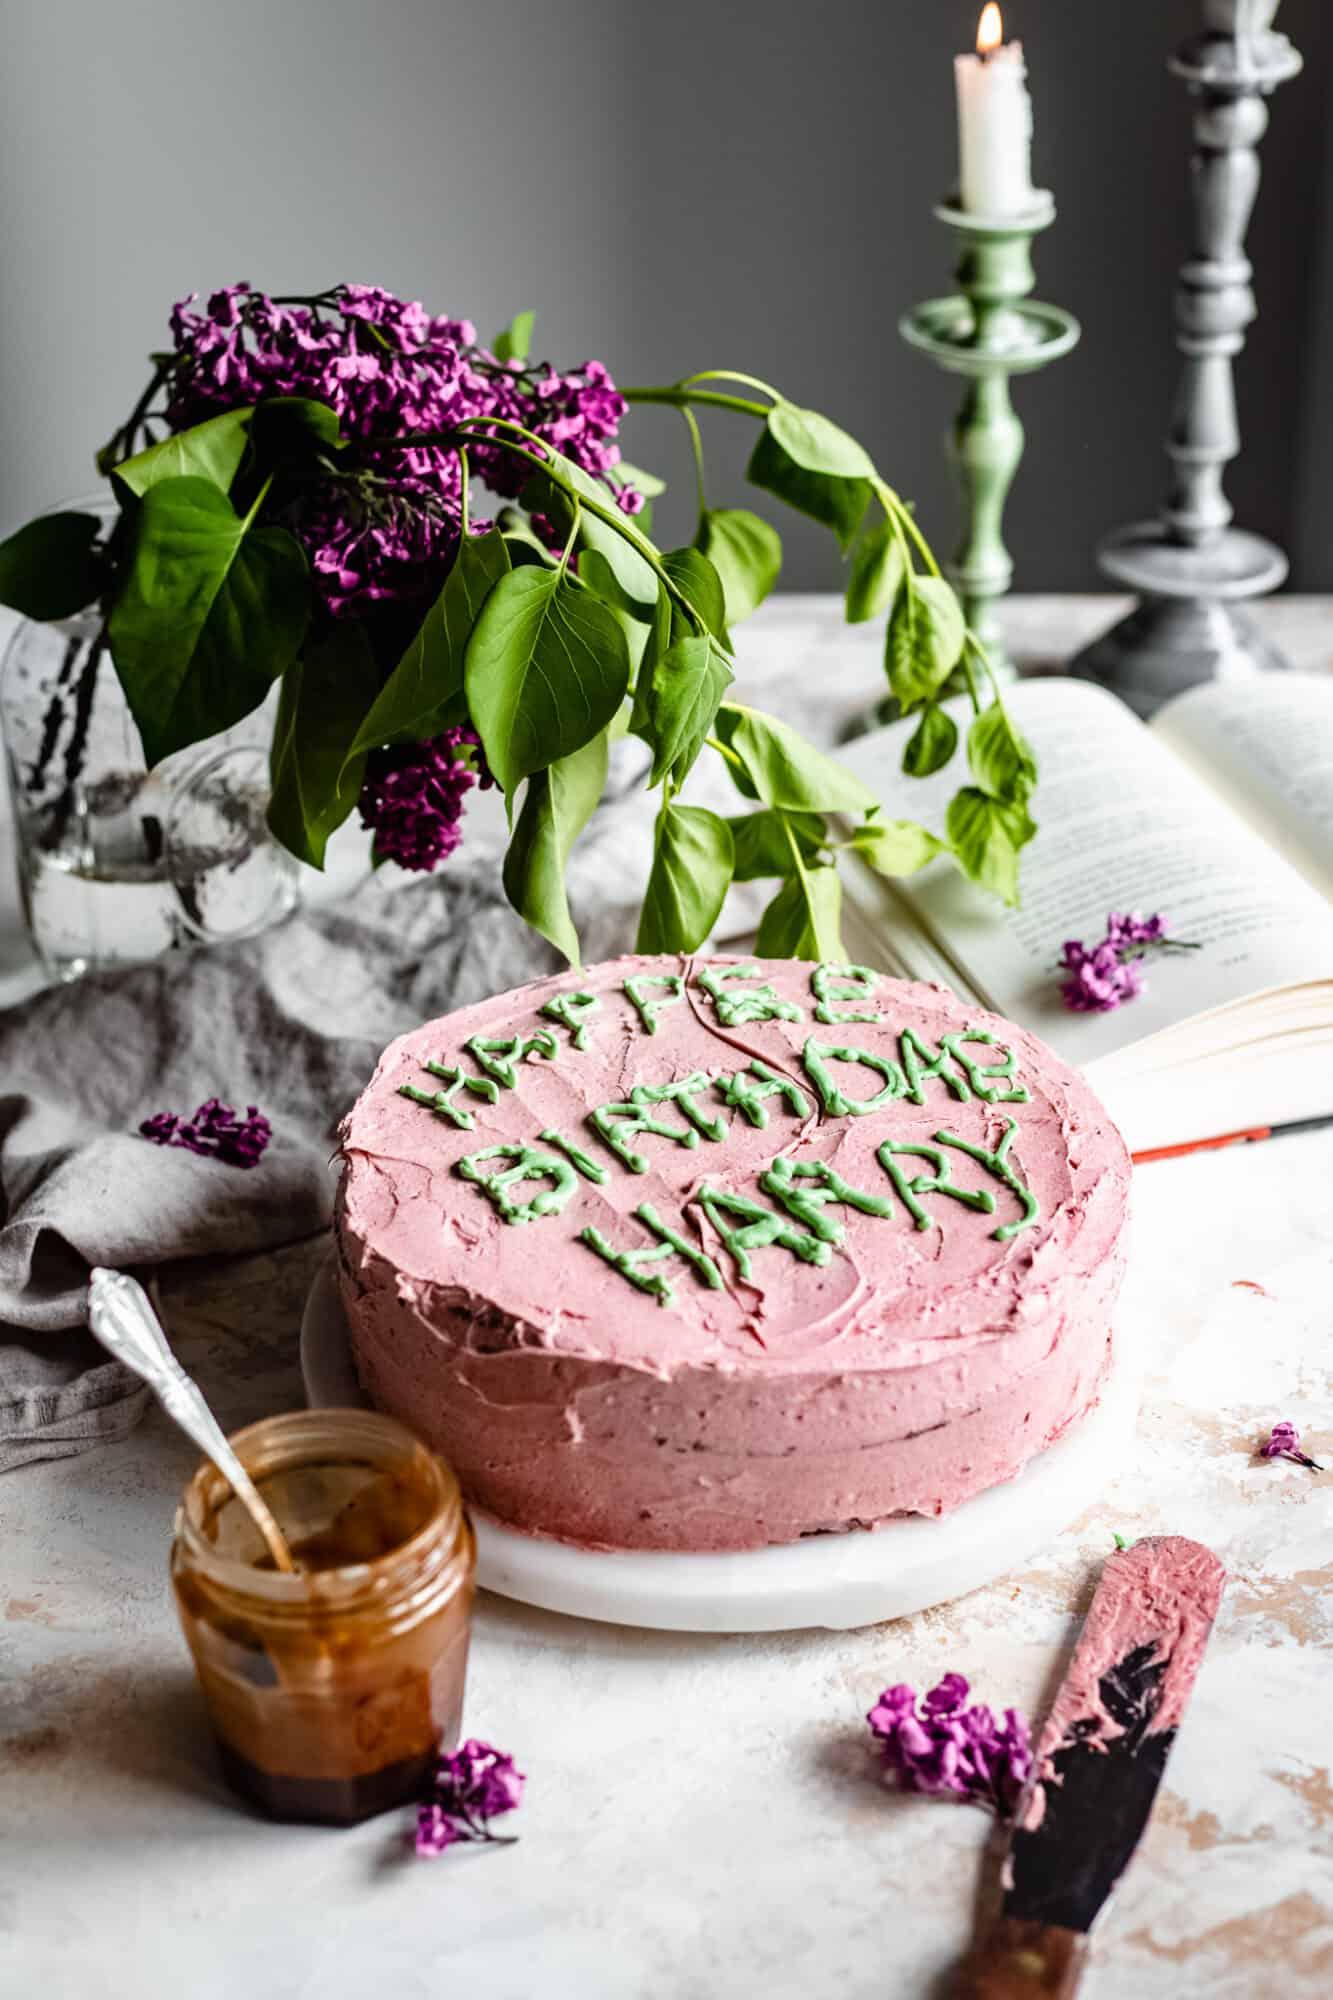 harry potter scene with birthday cake